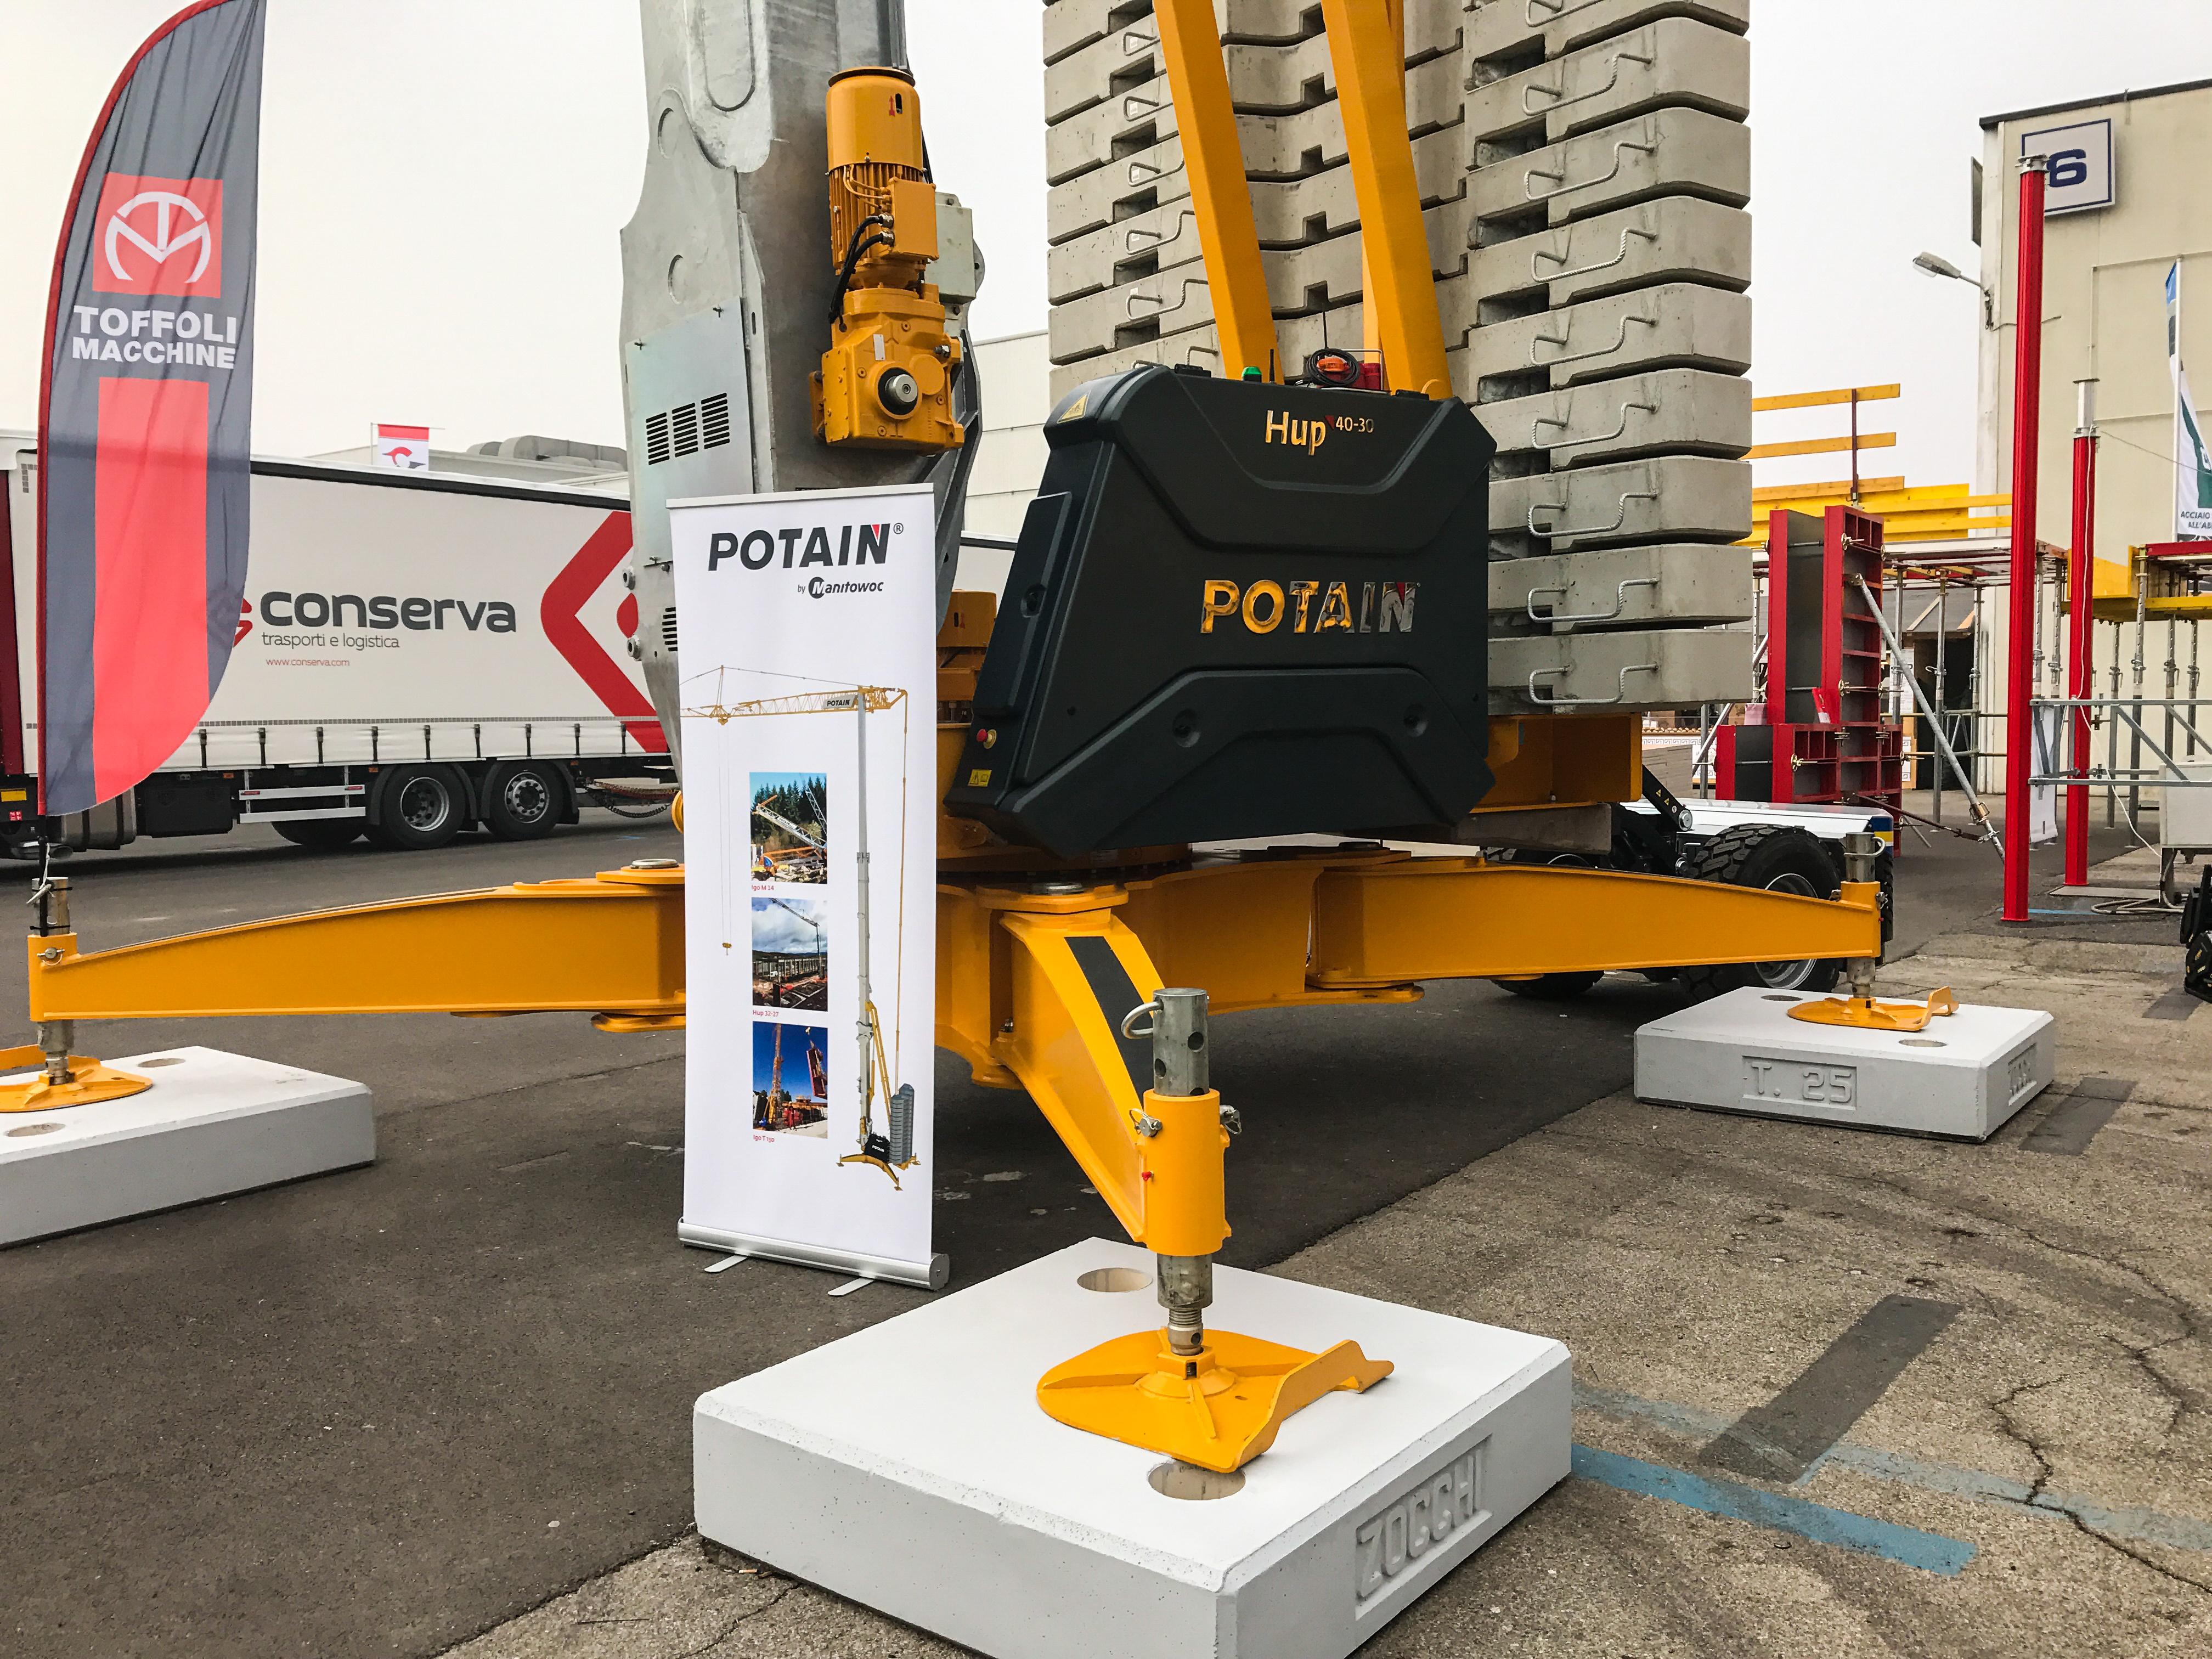 Potain Hup cranes showcased at Italian trade fair SaMoTer